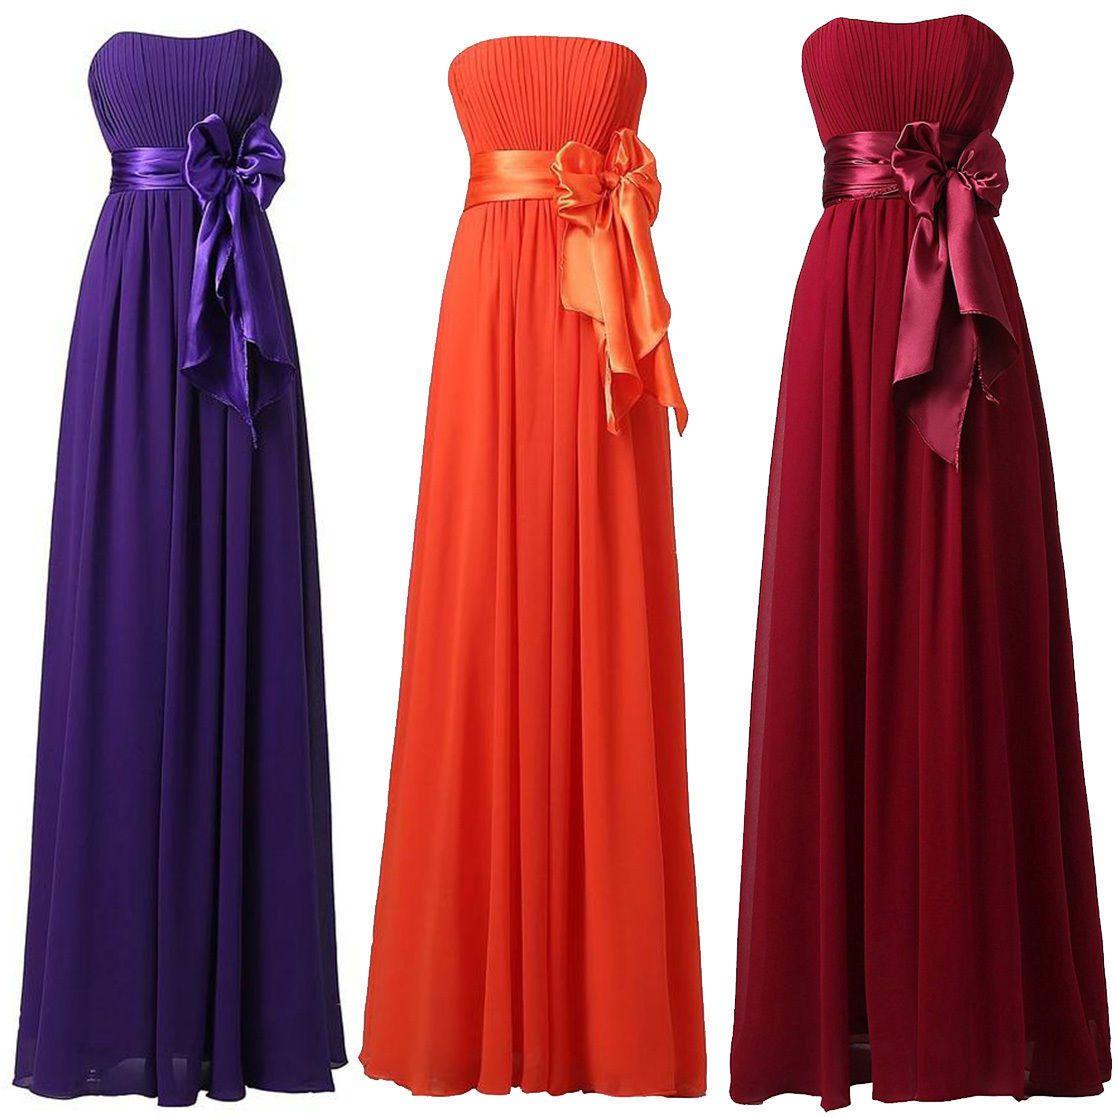 Cool prom dresses usa us womens long formal wedding bridesmaid dress